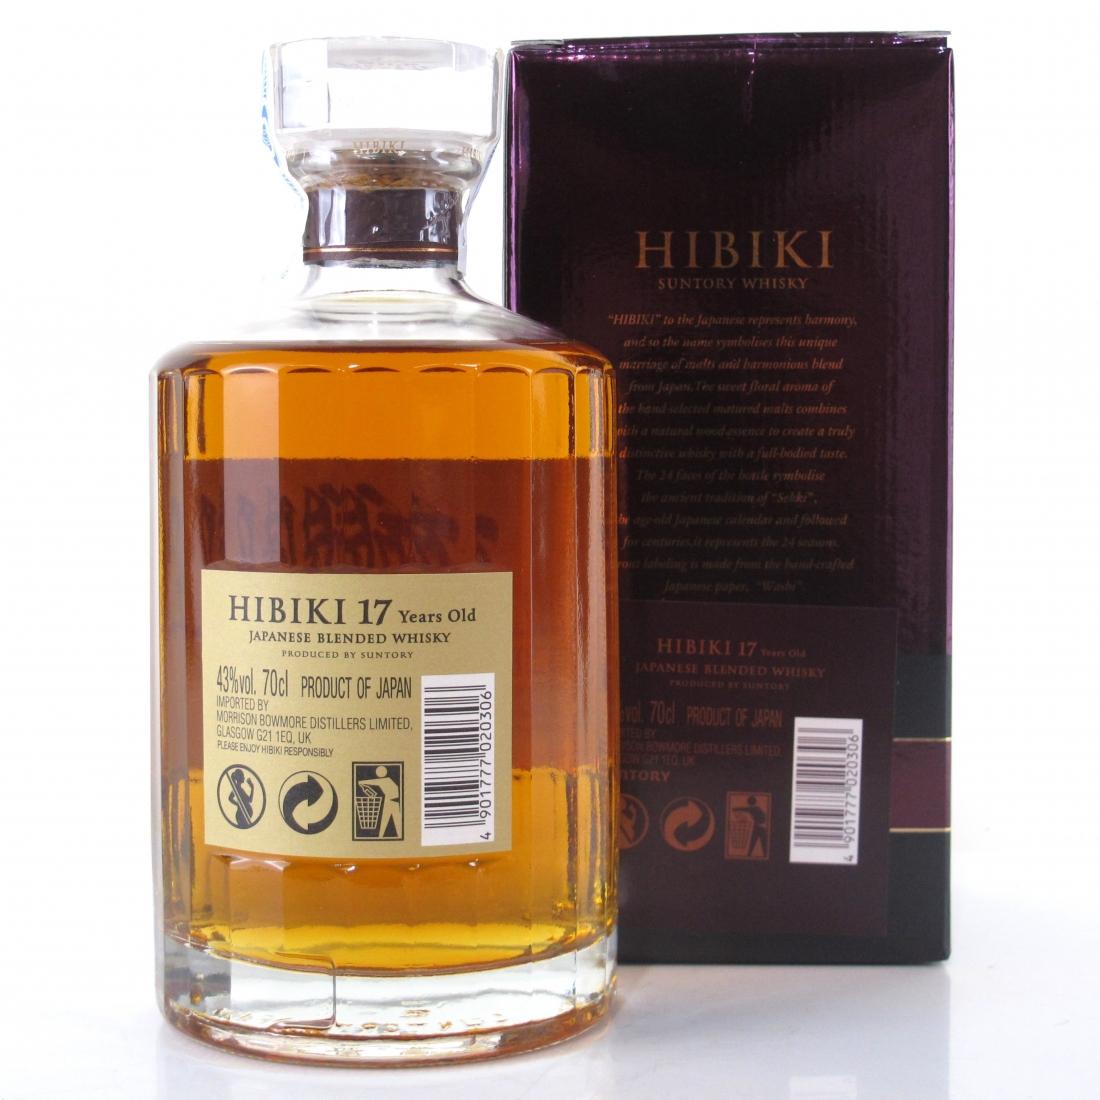 Hibiki 17 Year Old